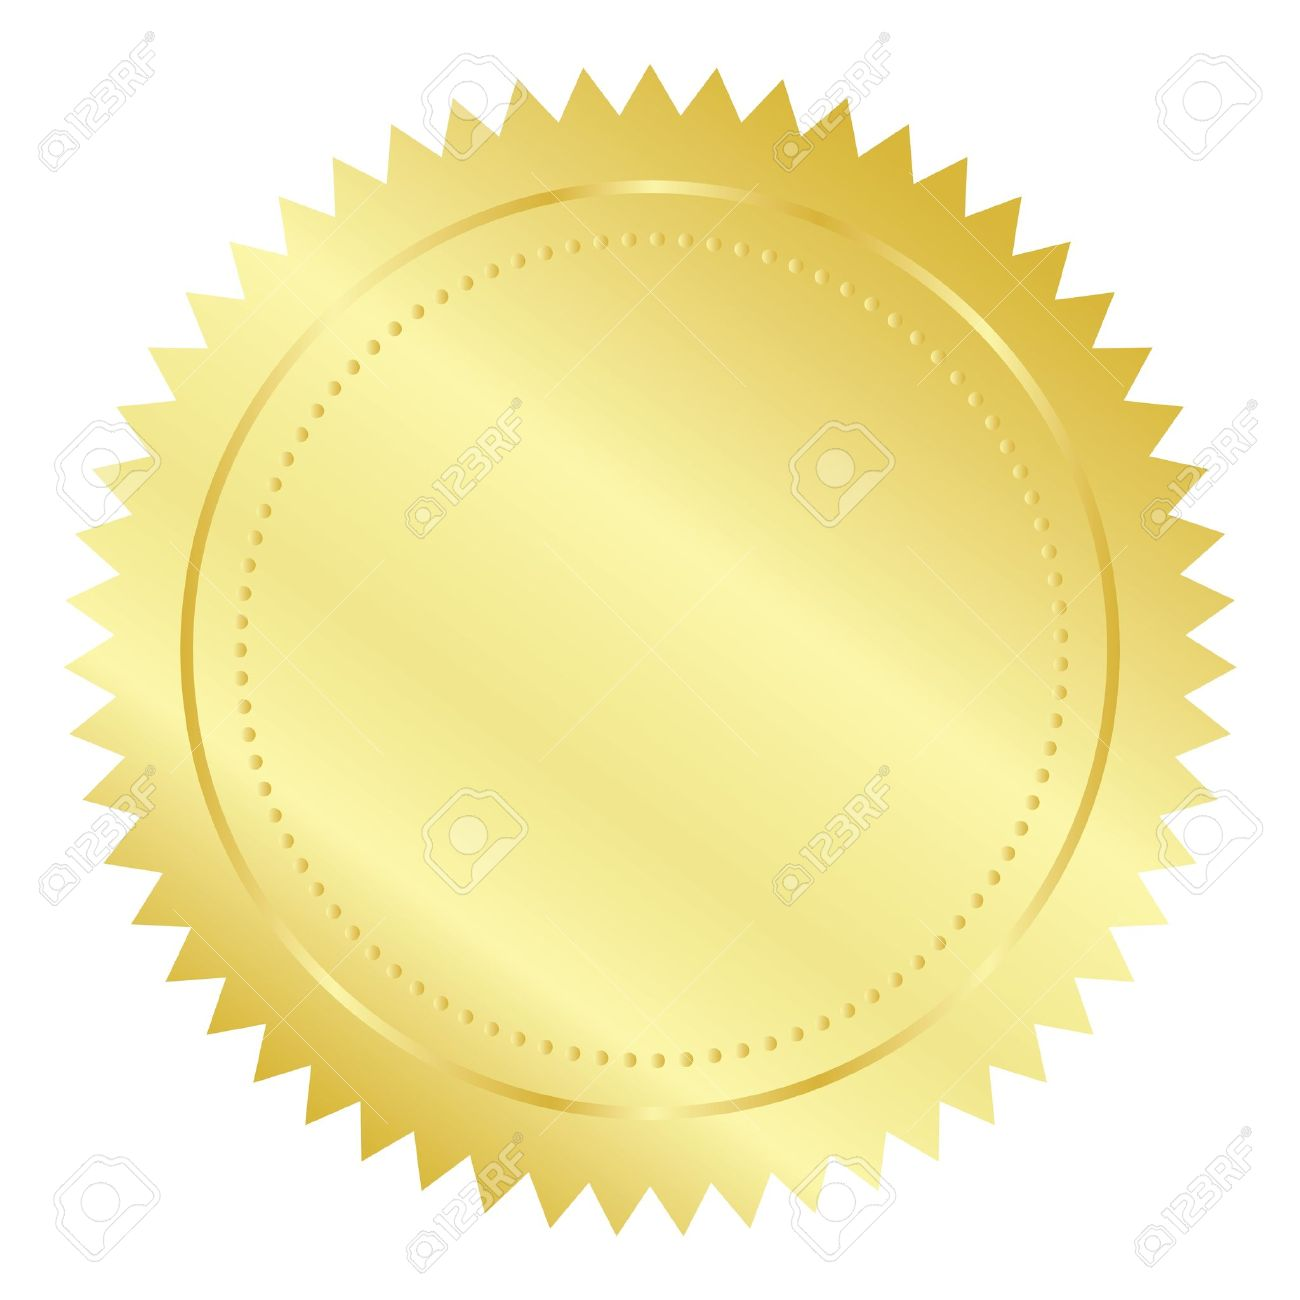 Vector illustration of gold seal.